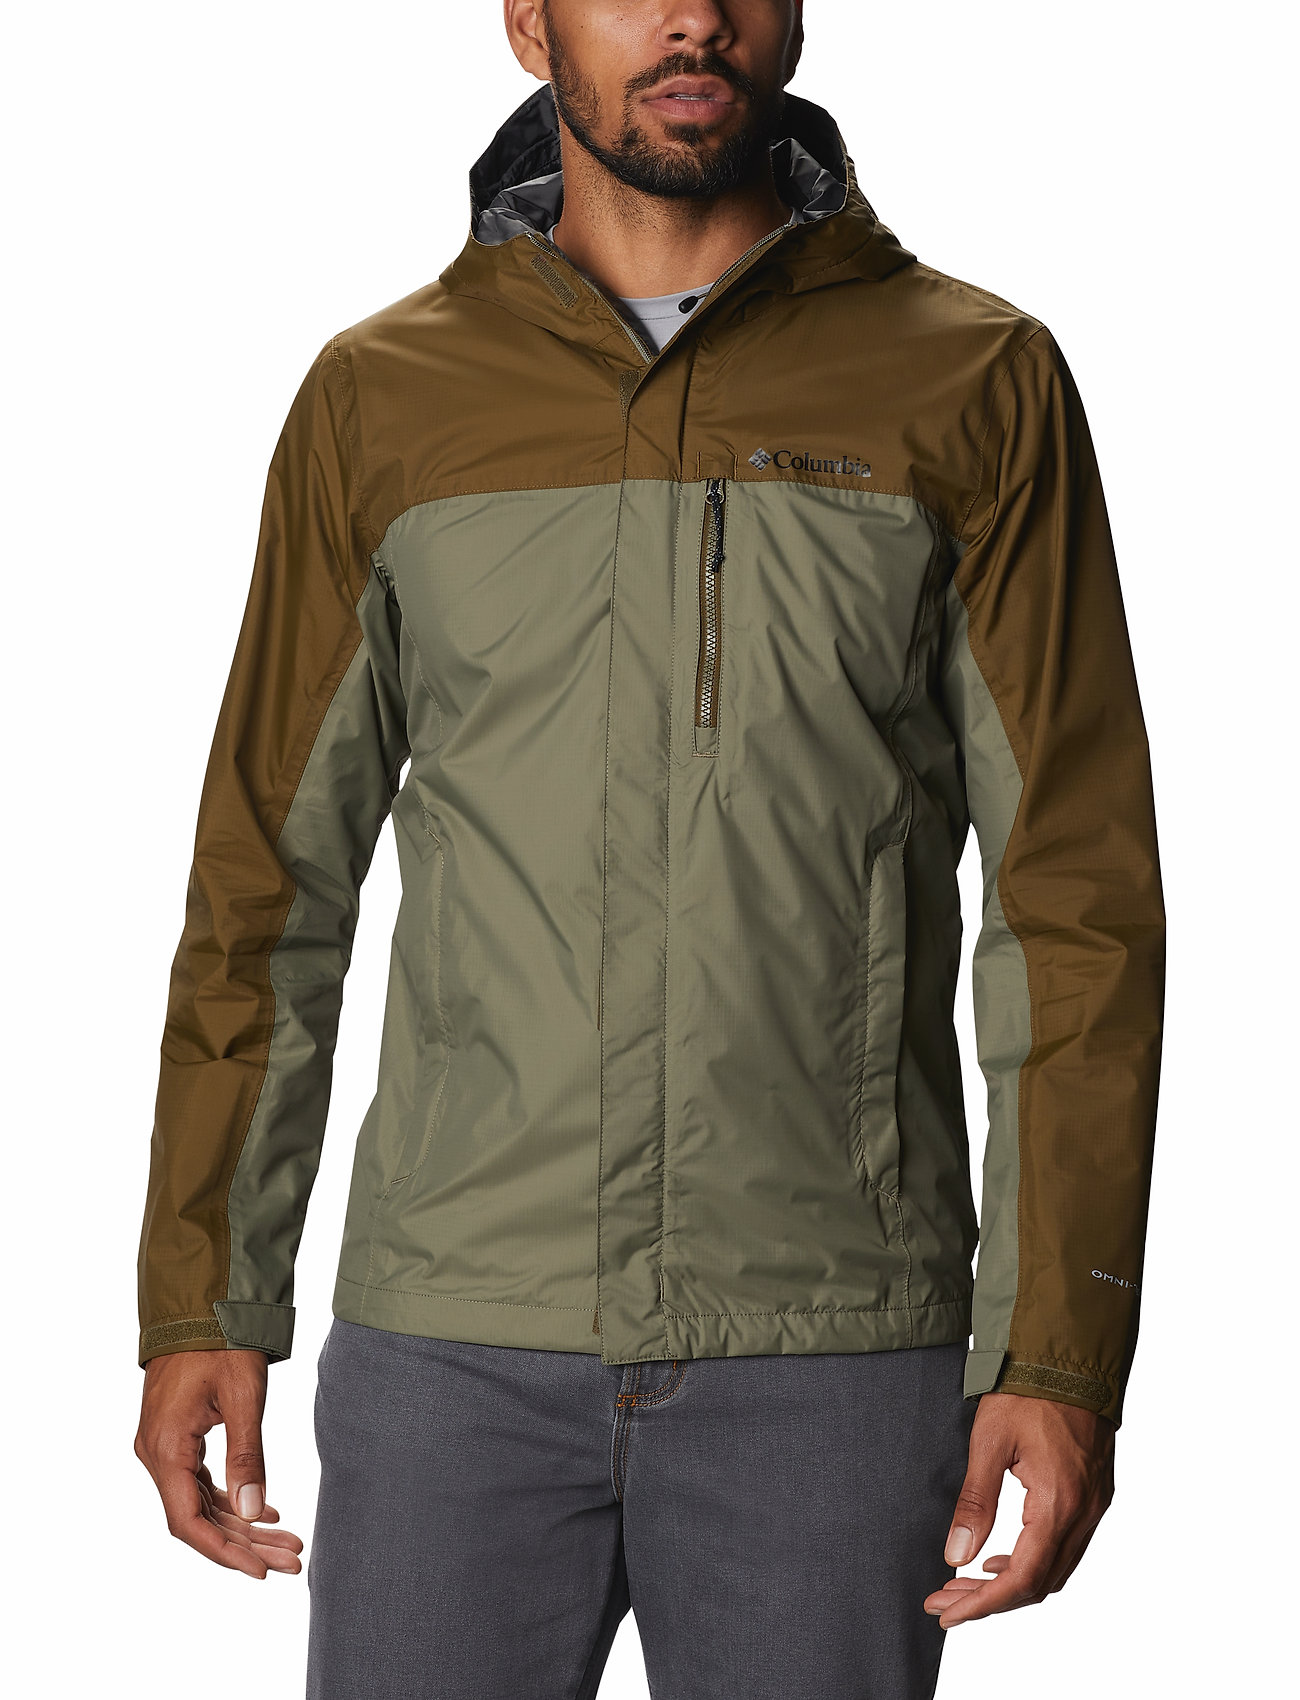 Columbia - Pouring Adventure™ II Jacket - kurtki sportowe - stone green, new olive - 0